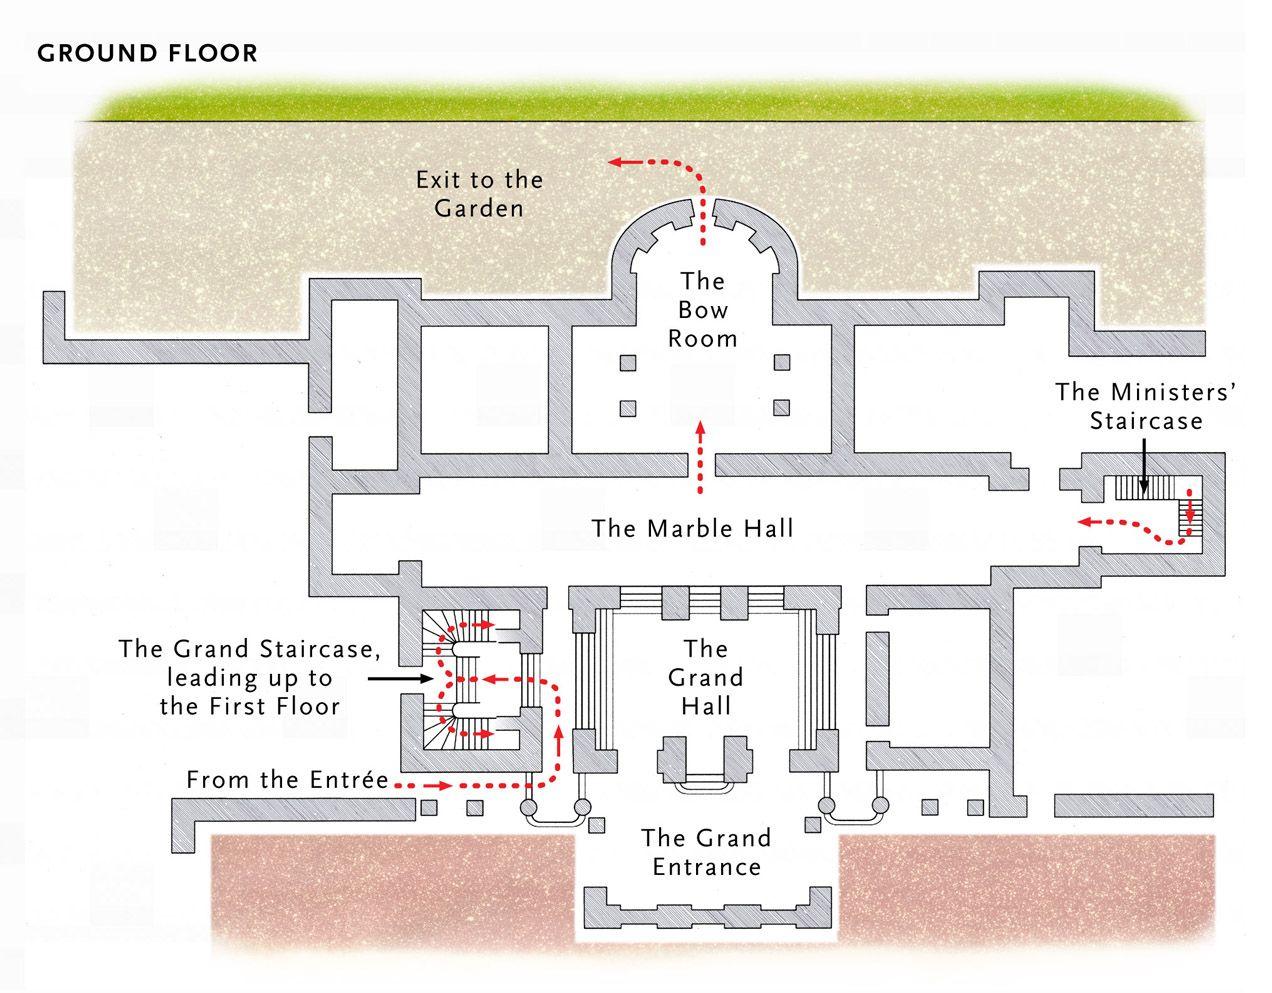 Basic Plan Of The Ground Floor At Buckingham Palace Buckingham Palace Floor Plan Buckingham Palace London Buckingham Palace